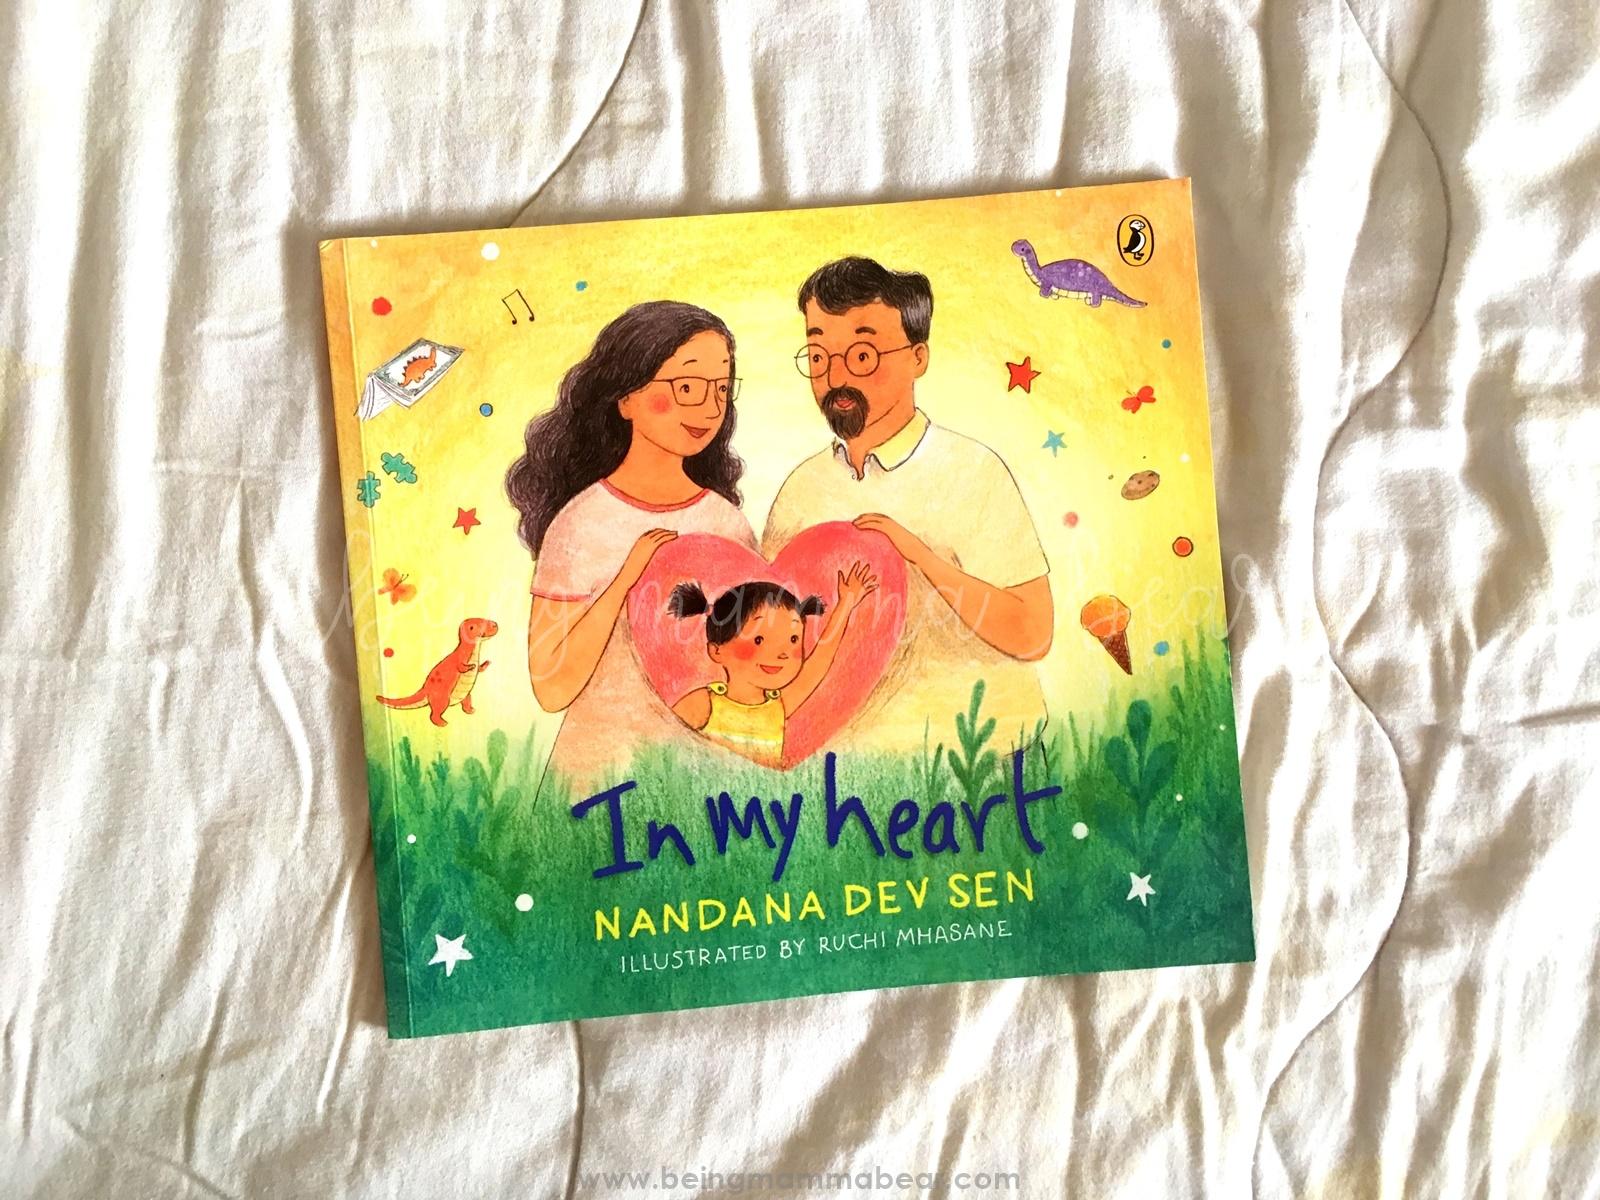 Being Mamma Bear Book Review In My Heart Nandana Dev Sen Ruchi Mhasane Puffin Books Penguin Random House - 4